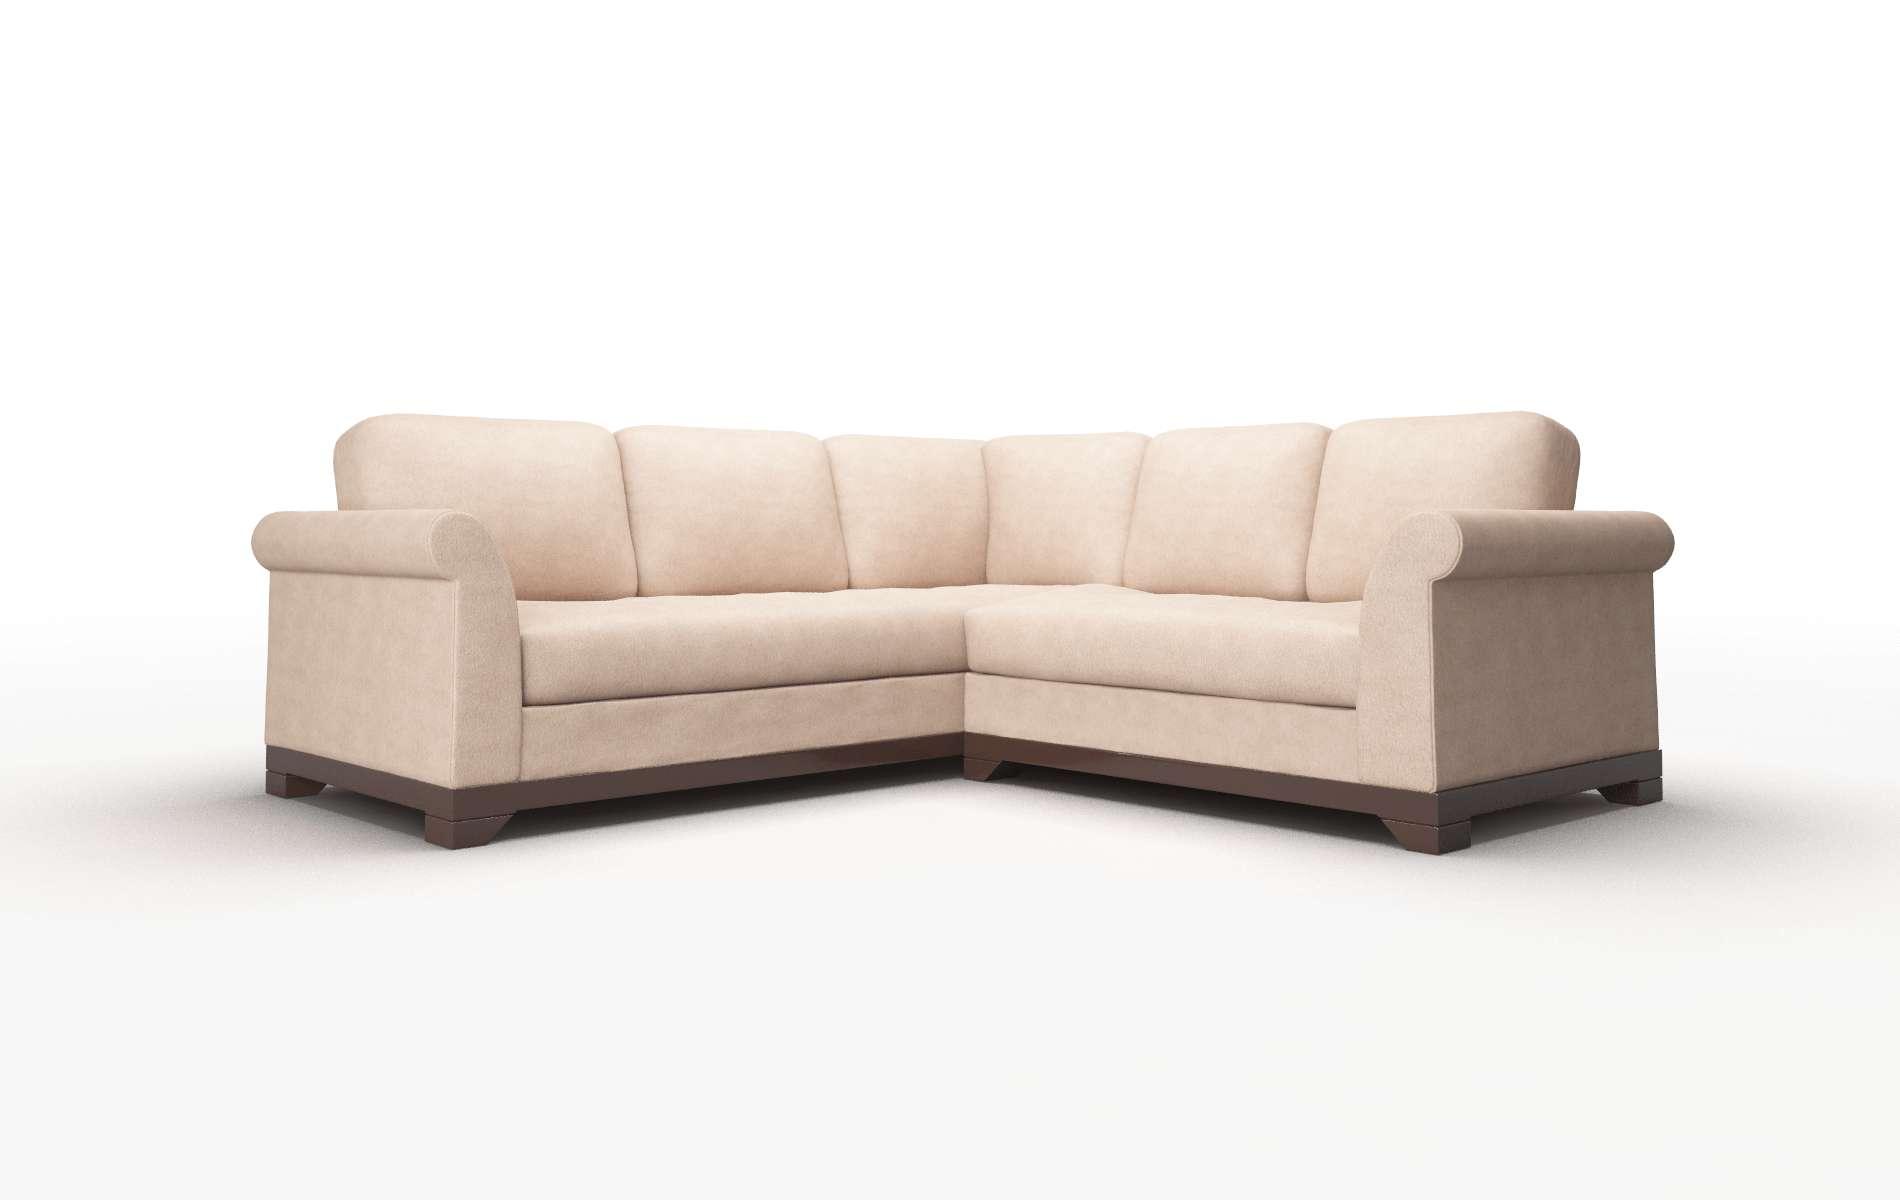 Remarkable Denver Bergamo Dove Sectional Dreamsofa Pabps2019 Chair Design Images Pabps2019Com